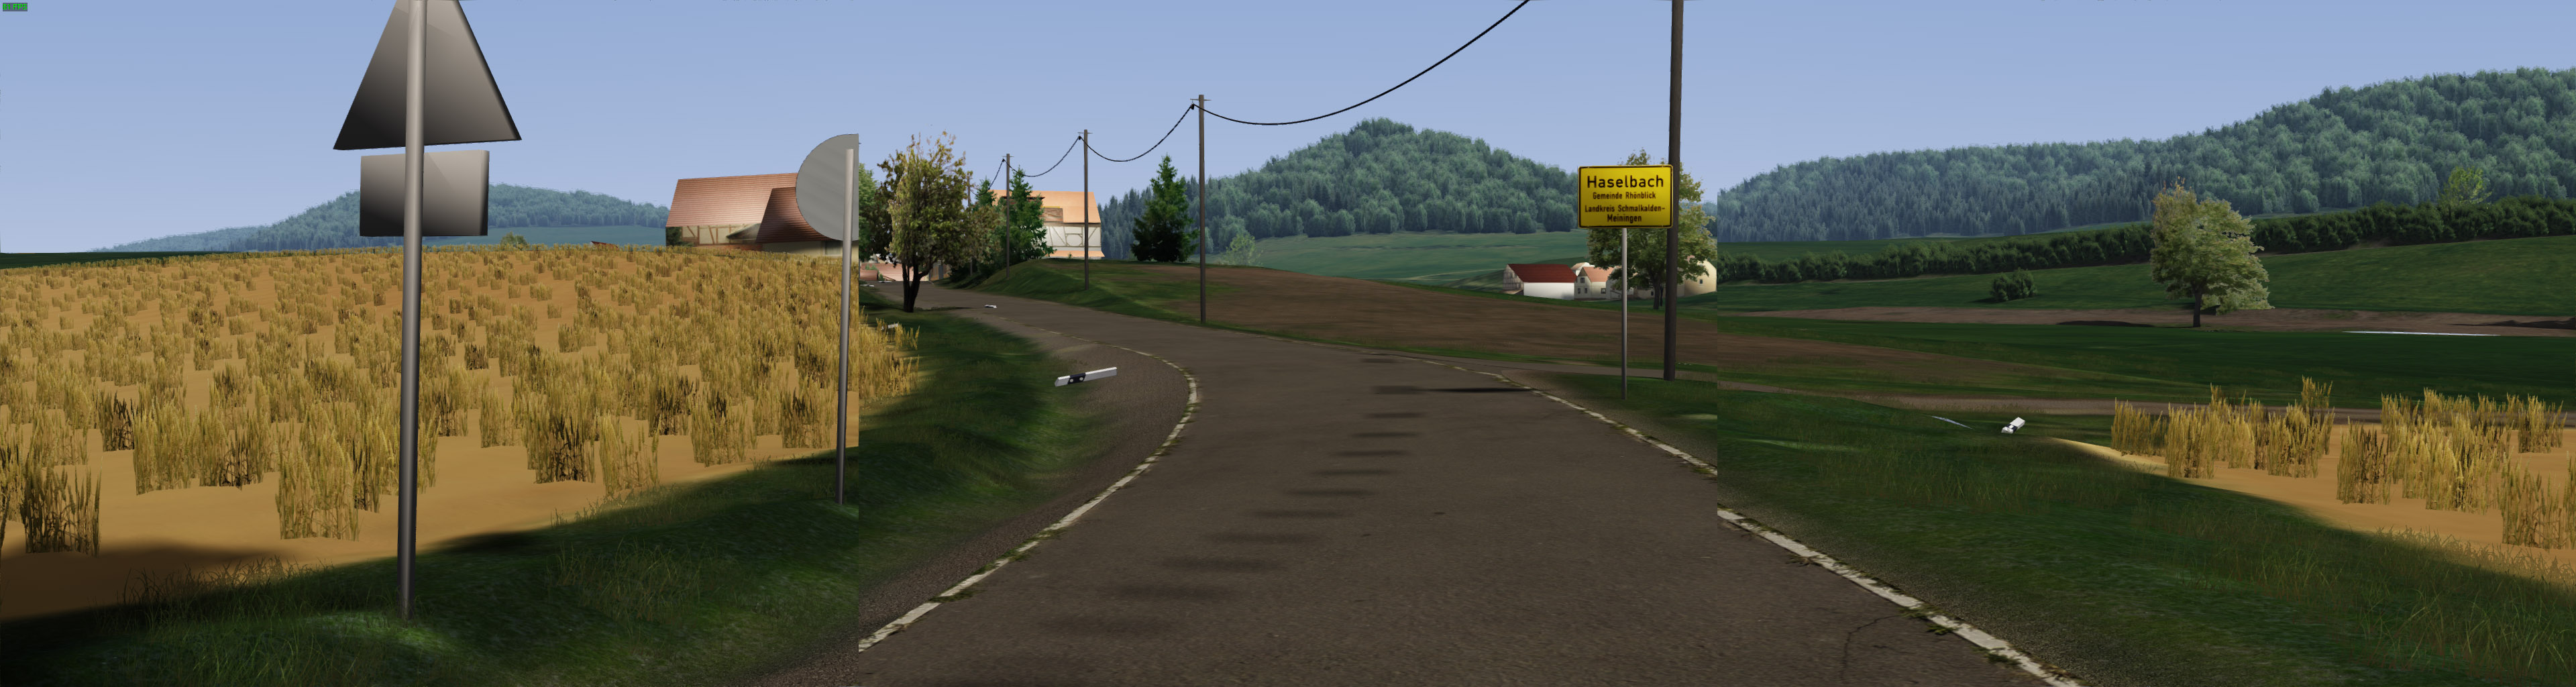 landsberg02-physical.jpg